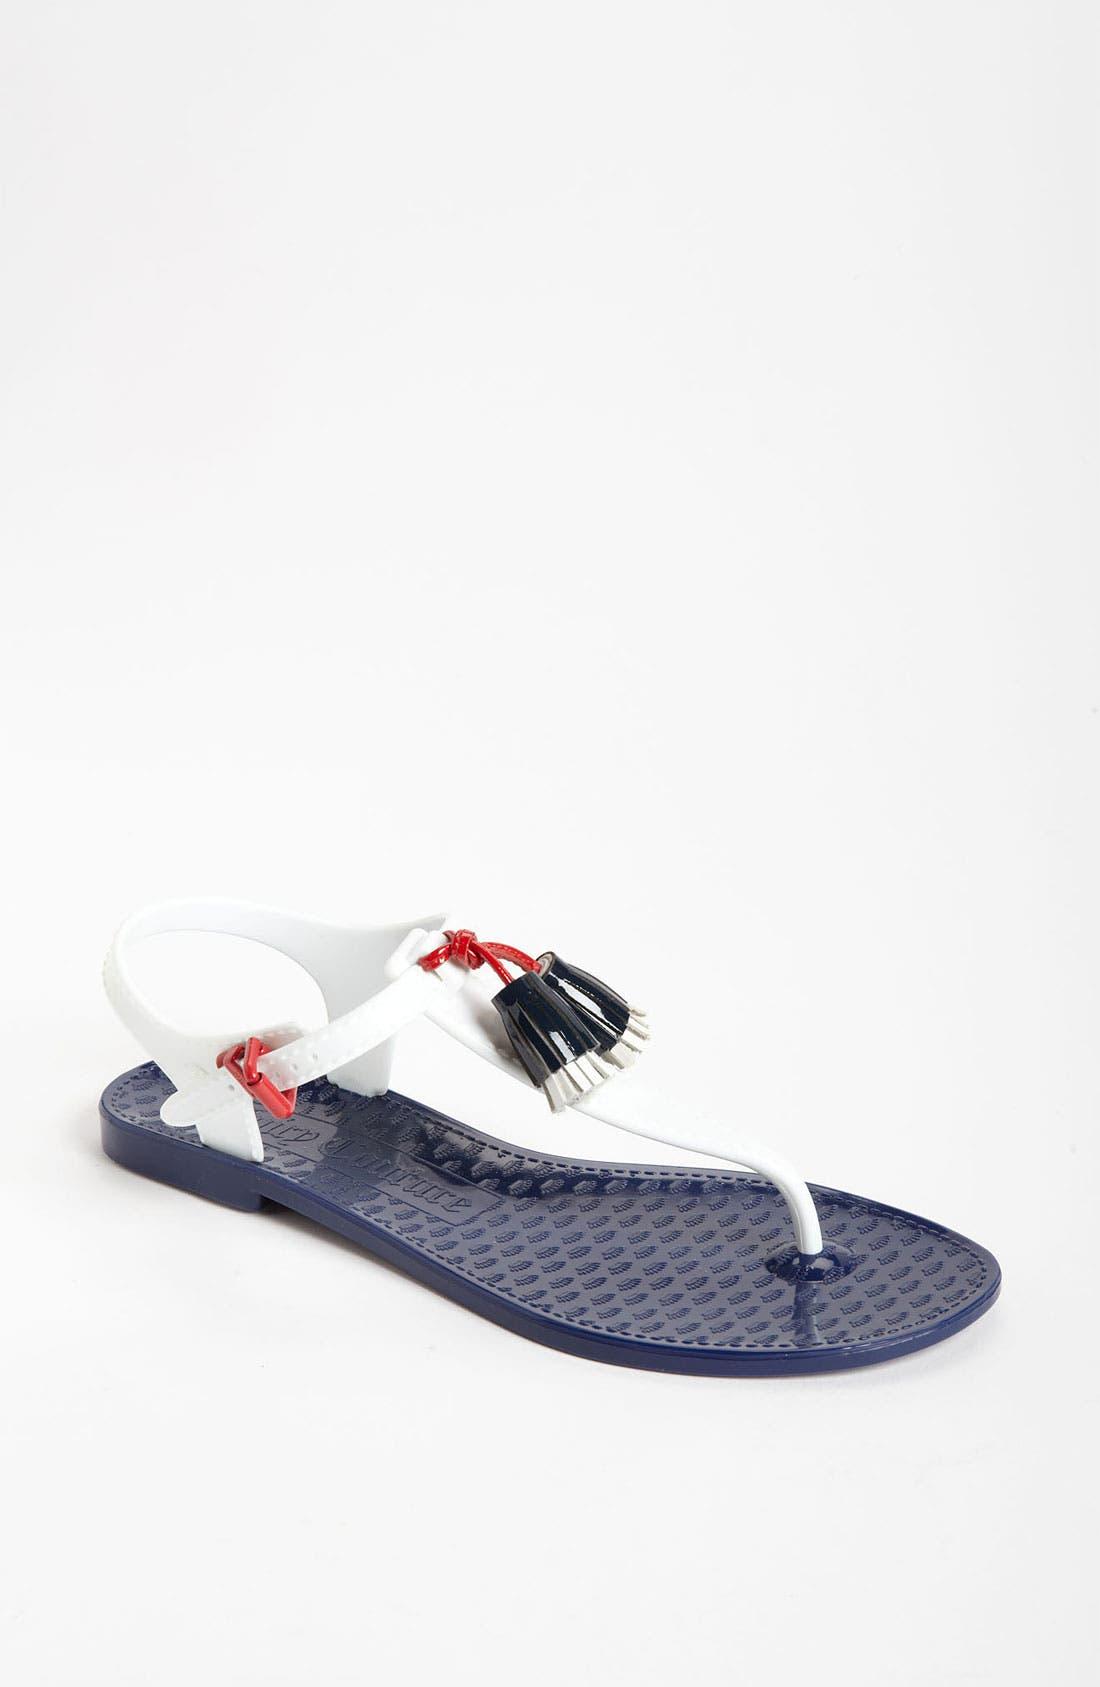 Alternate Image 1 Selected - Juicy Couture 'Wisp' Sandal